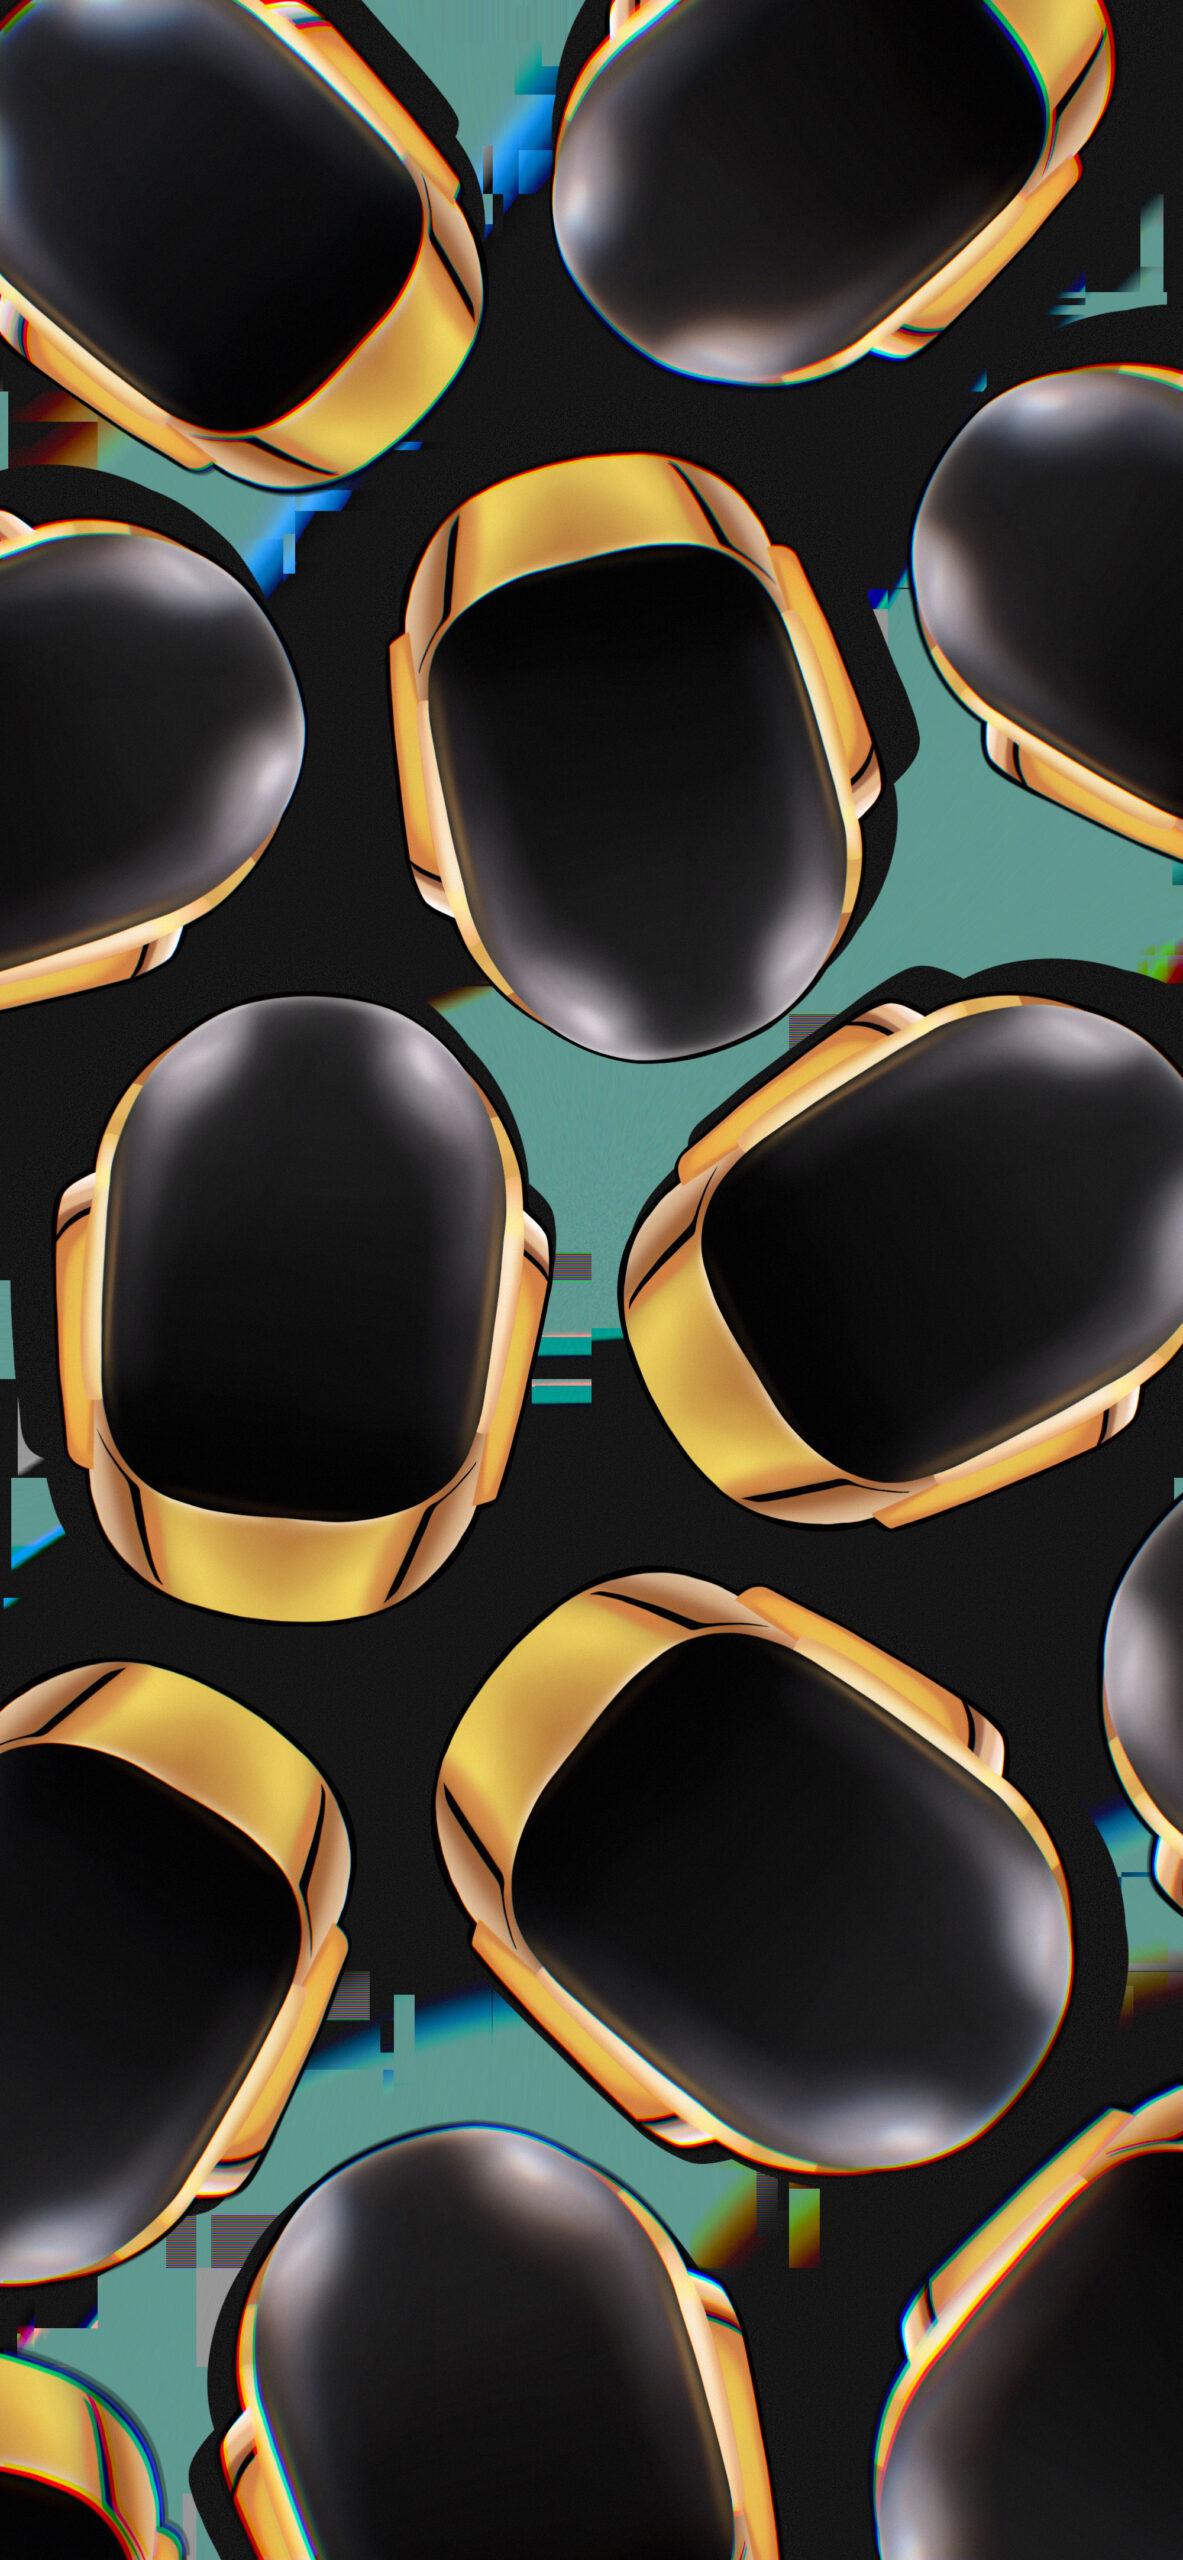 daft punk gold helmet black wallpaper